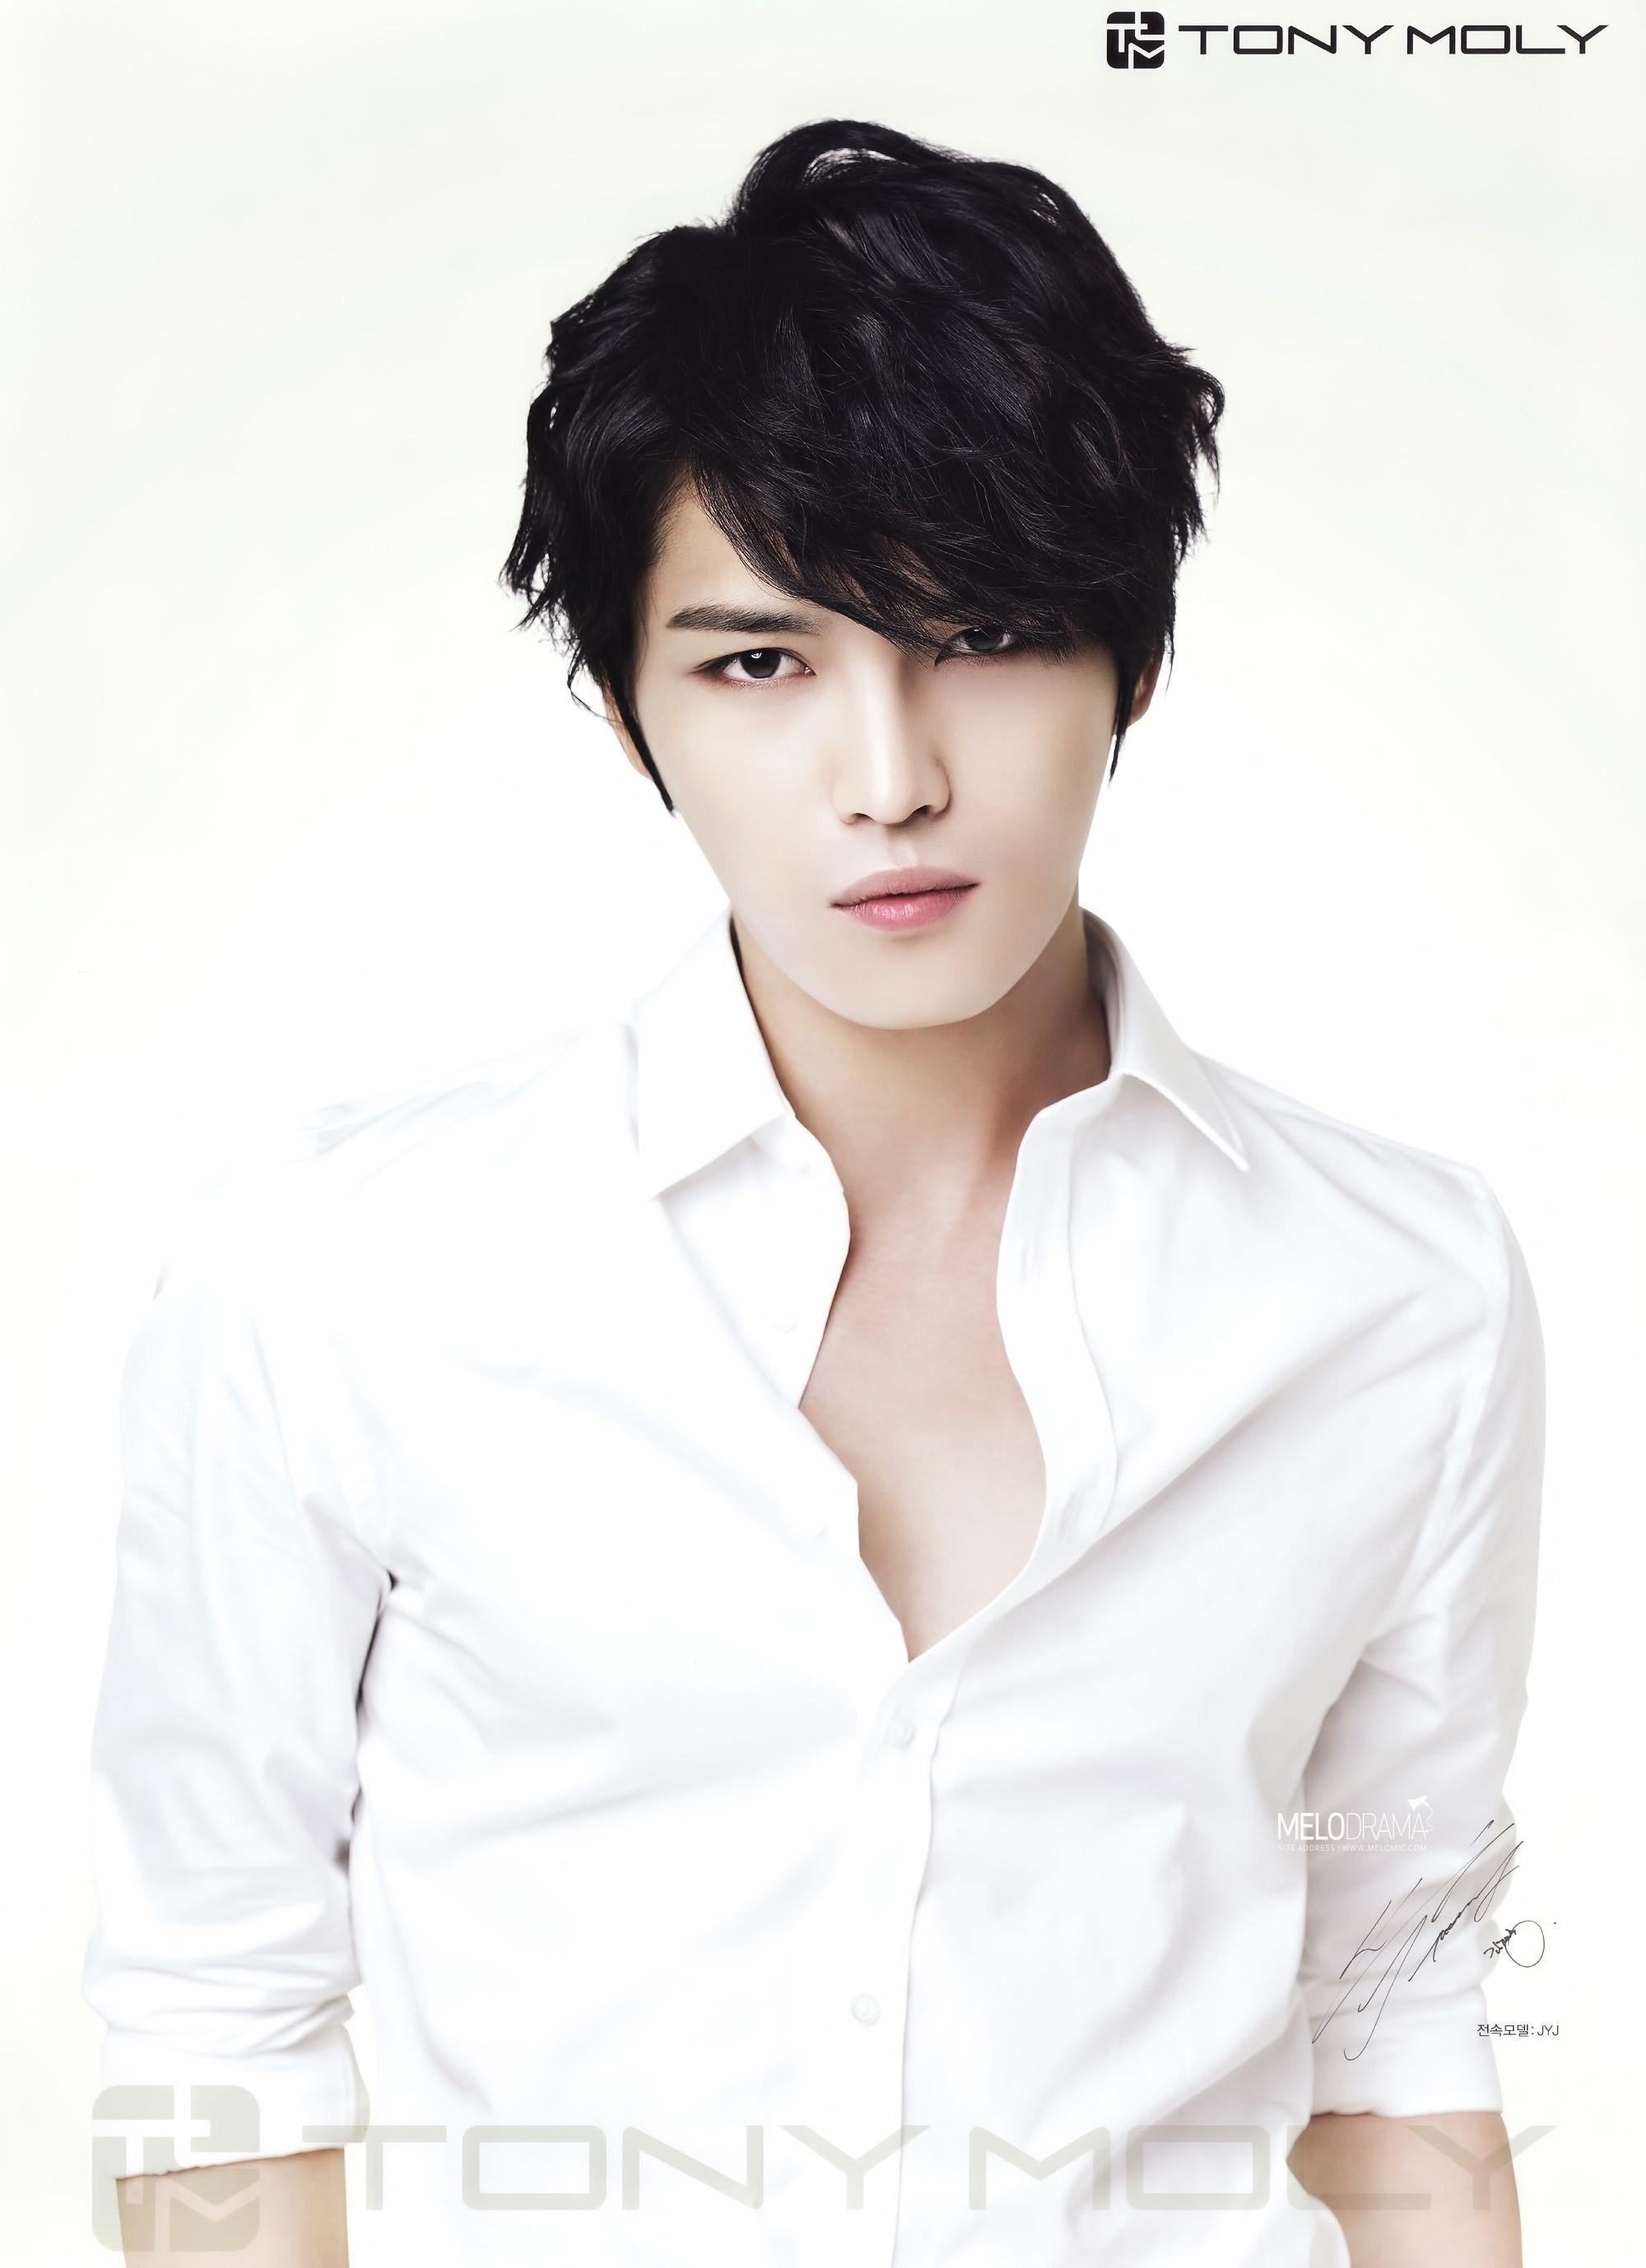 tonymoly1 photo by princejj_   photobucket   kim jaejoong